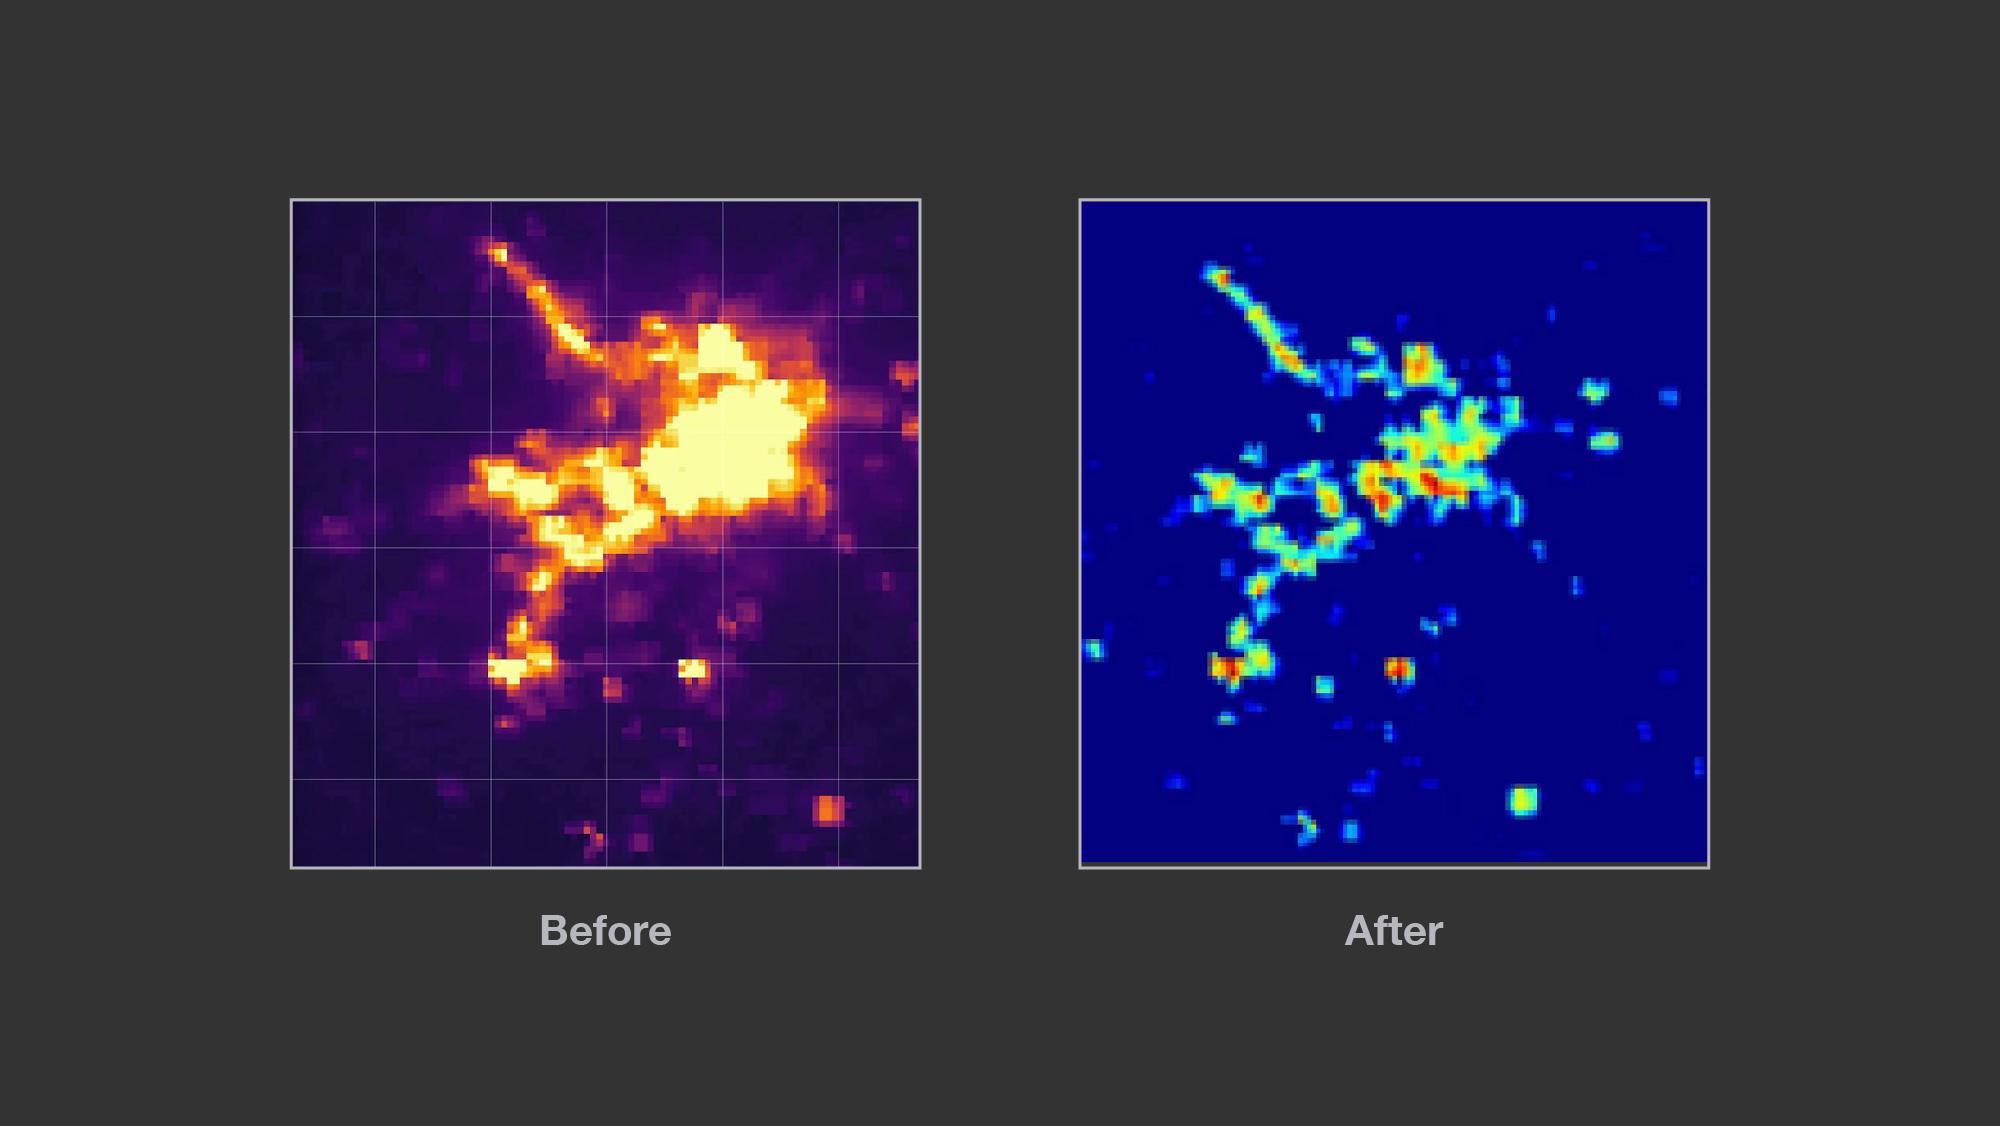 Left: Composite image before filtering for nightlights. Right:Composite image after filtering out nightlights, showing settlement level electrification